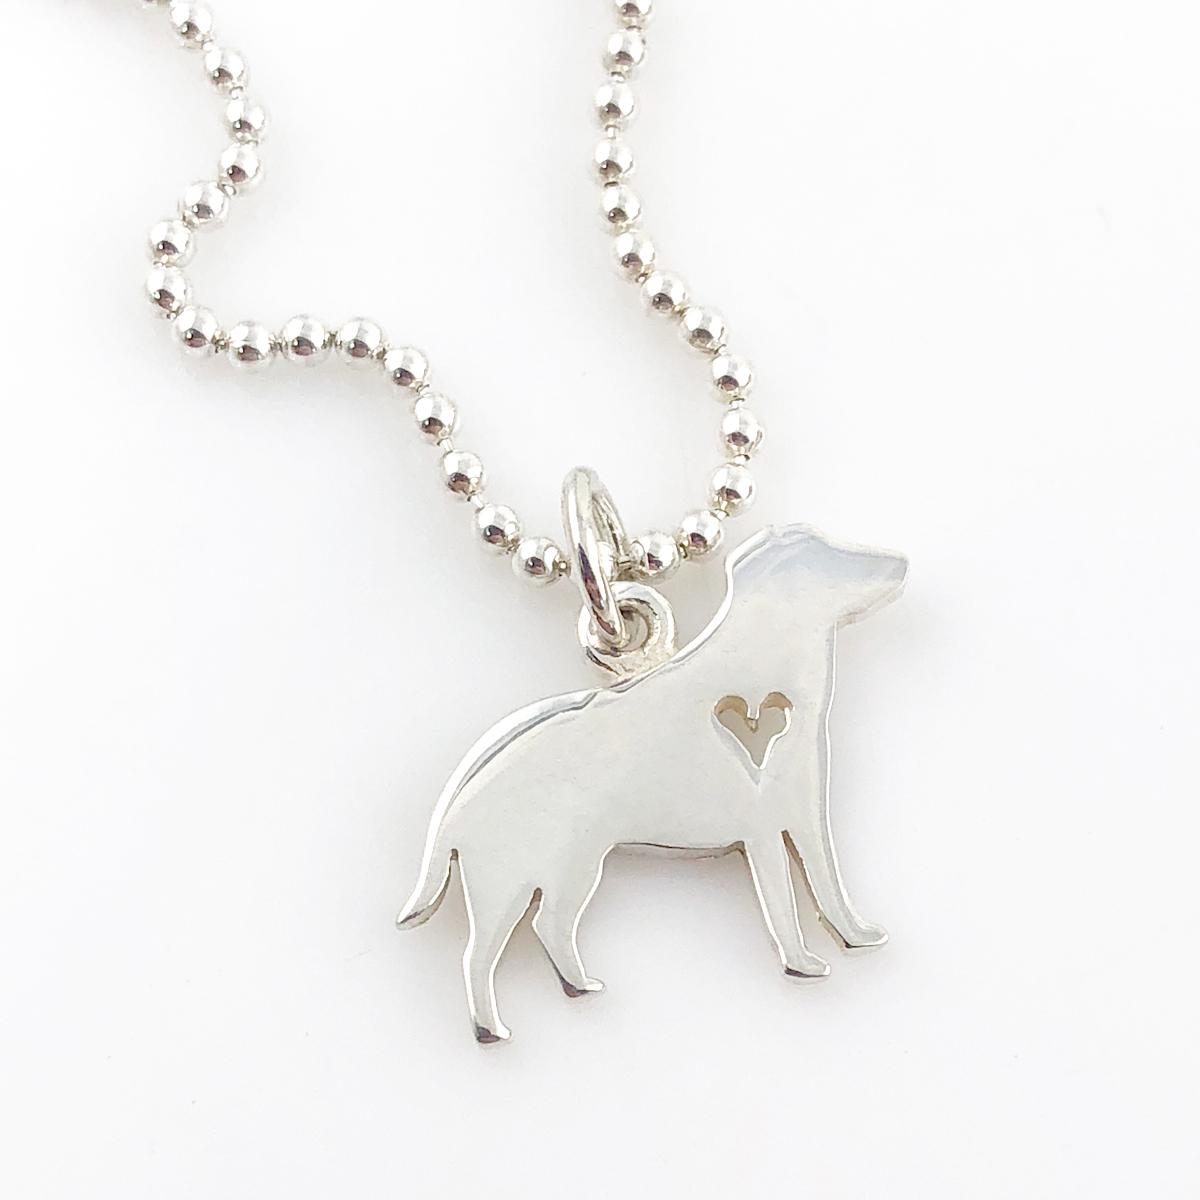 Retriever Simple Charm Necklace - Dog Necklace